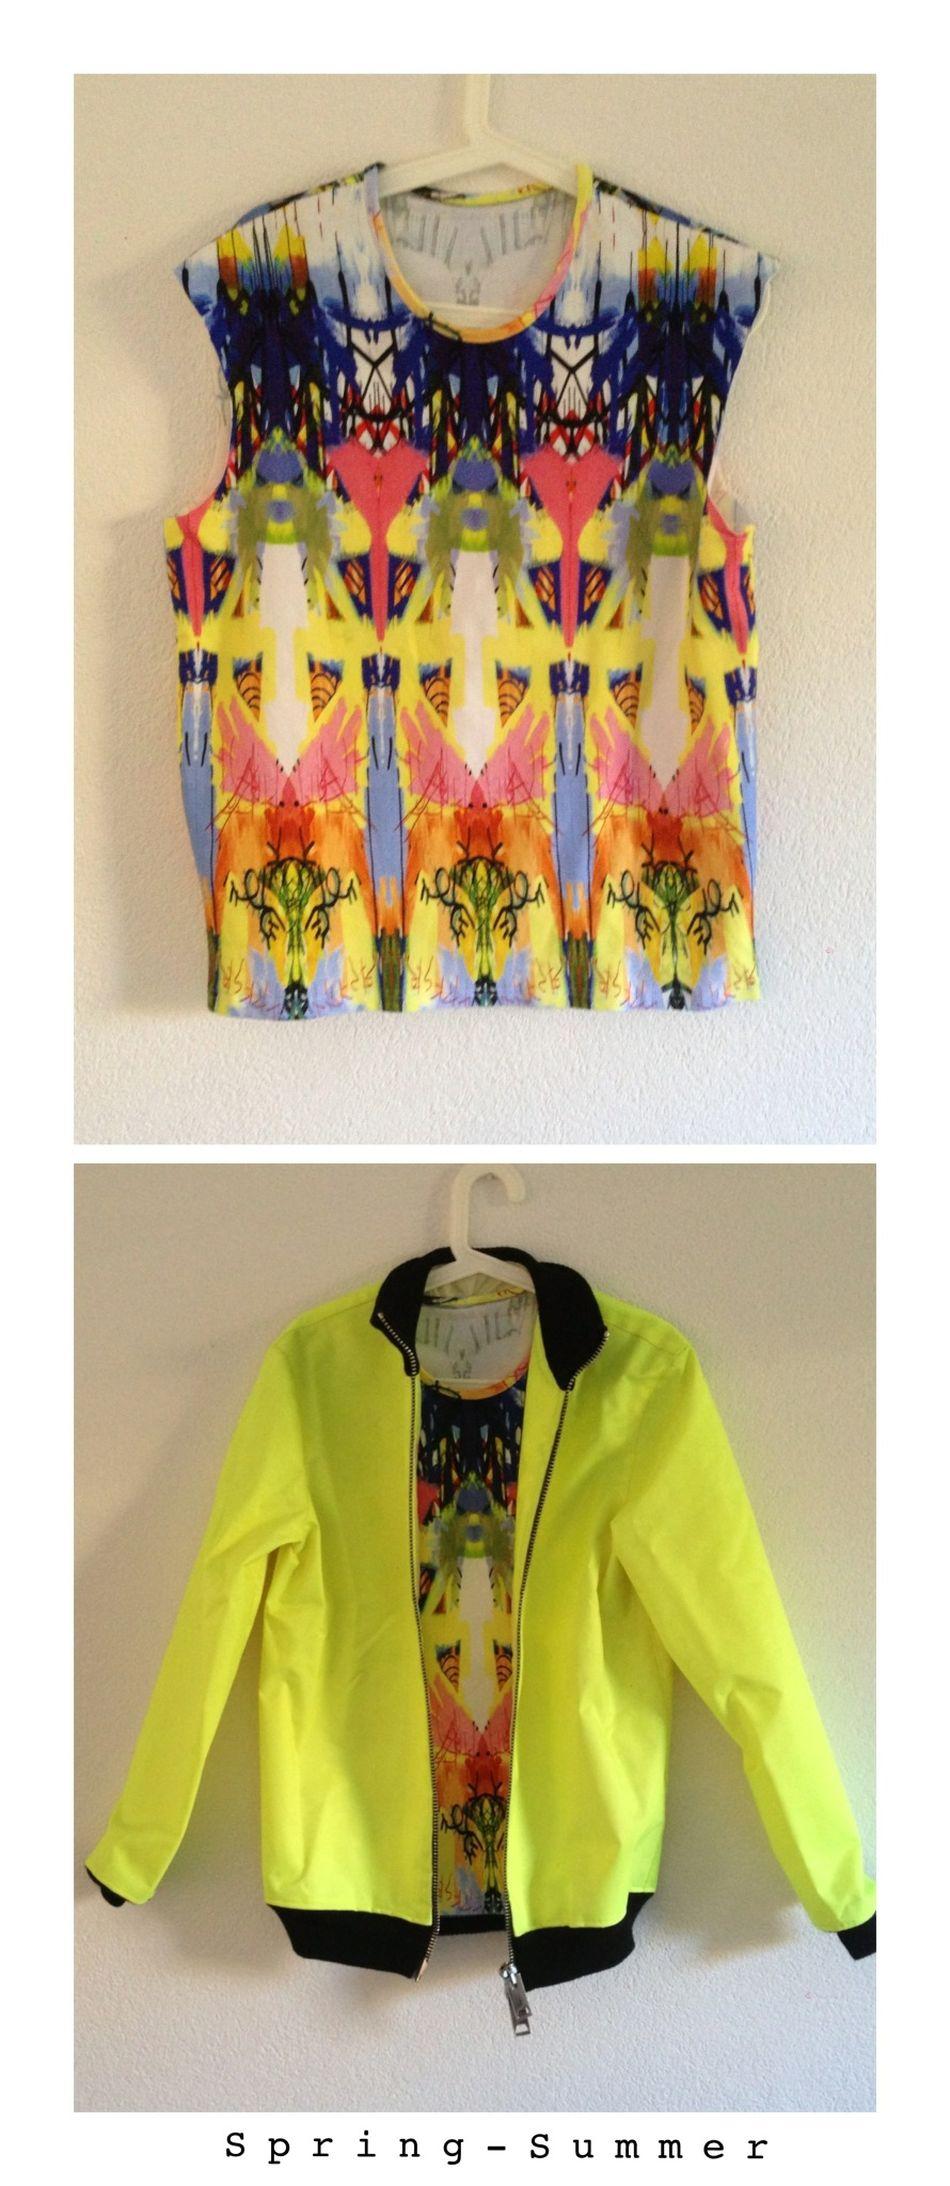 Fashion DFMcolletion Mynewcreation Springsummer